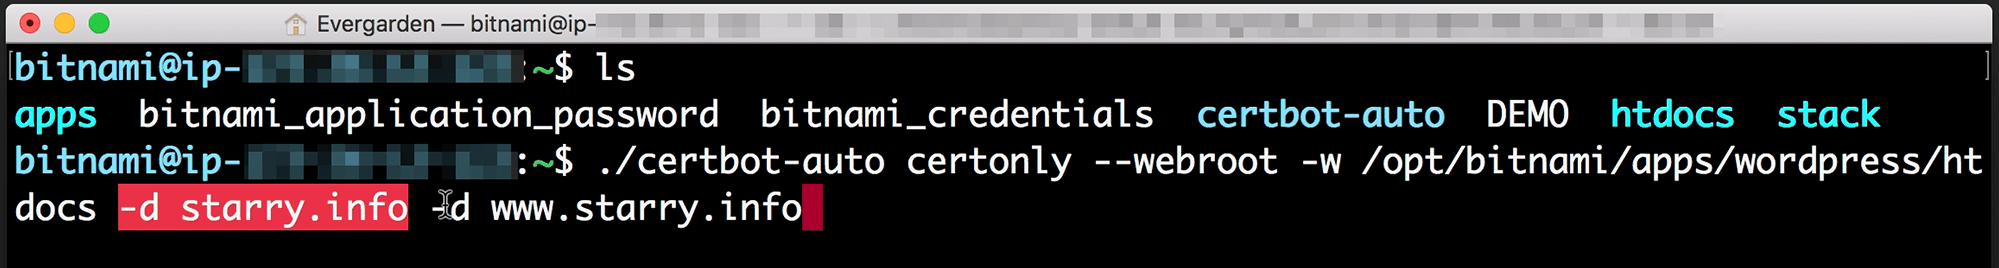 SSL 인증서 발급프로그램 cerbot-auto 실행함